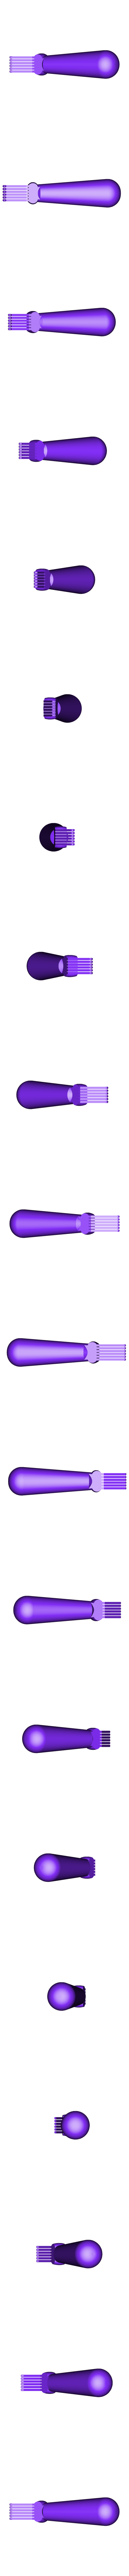 Fincomb2-6a.stl Download free STL file condenser radiator aluminium fin comb 2.8mm spacing • Design to 3D print, glassy